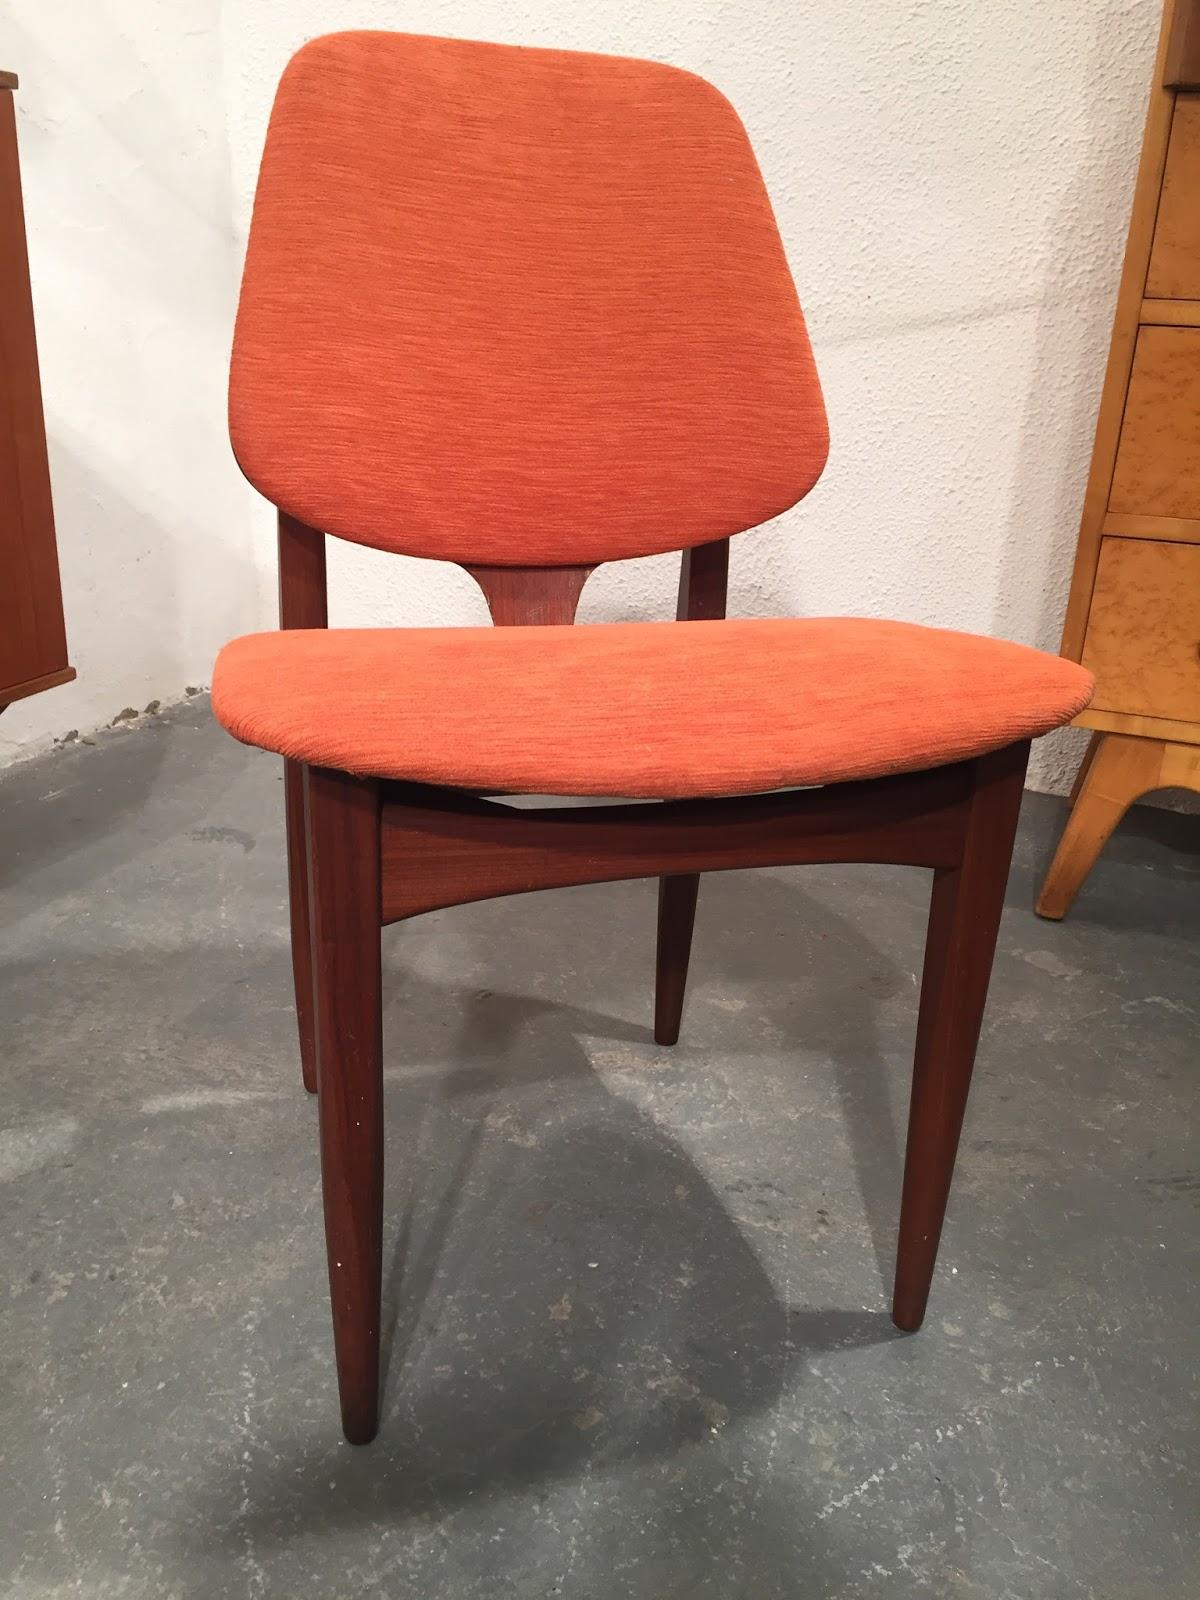 Admirable Vintage Furniture Ireland Ocd The Vintage Furniture Pabps2019 Chair Design Images Pabps2019Com